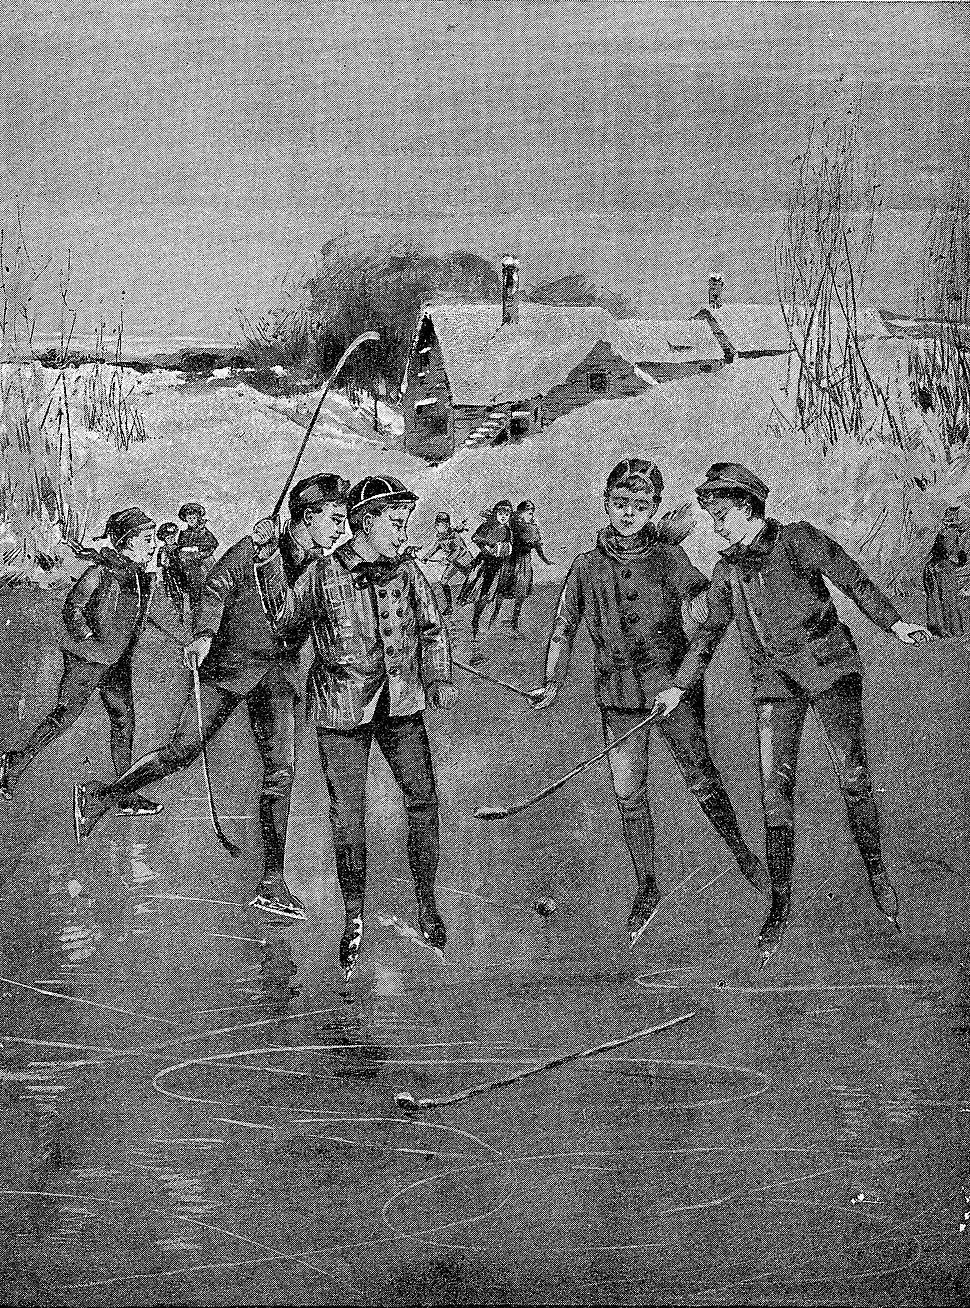 Children playing ice hockey - illustration